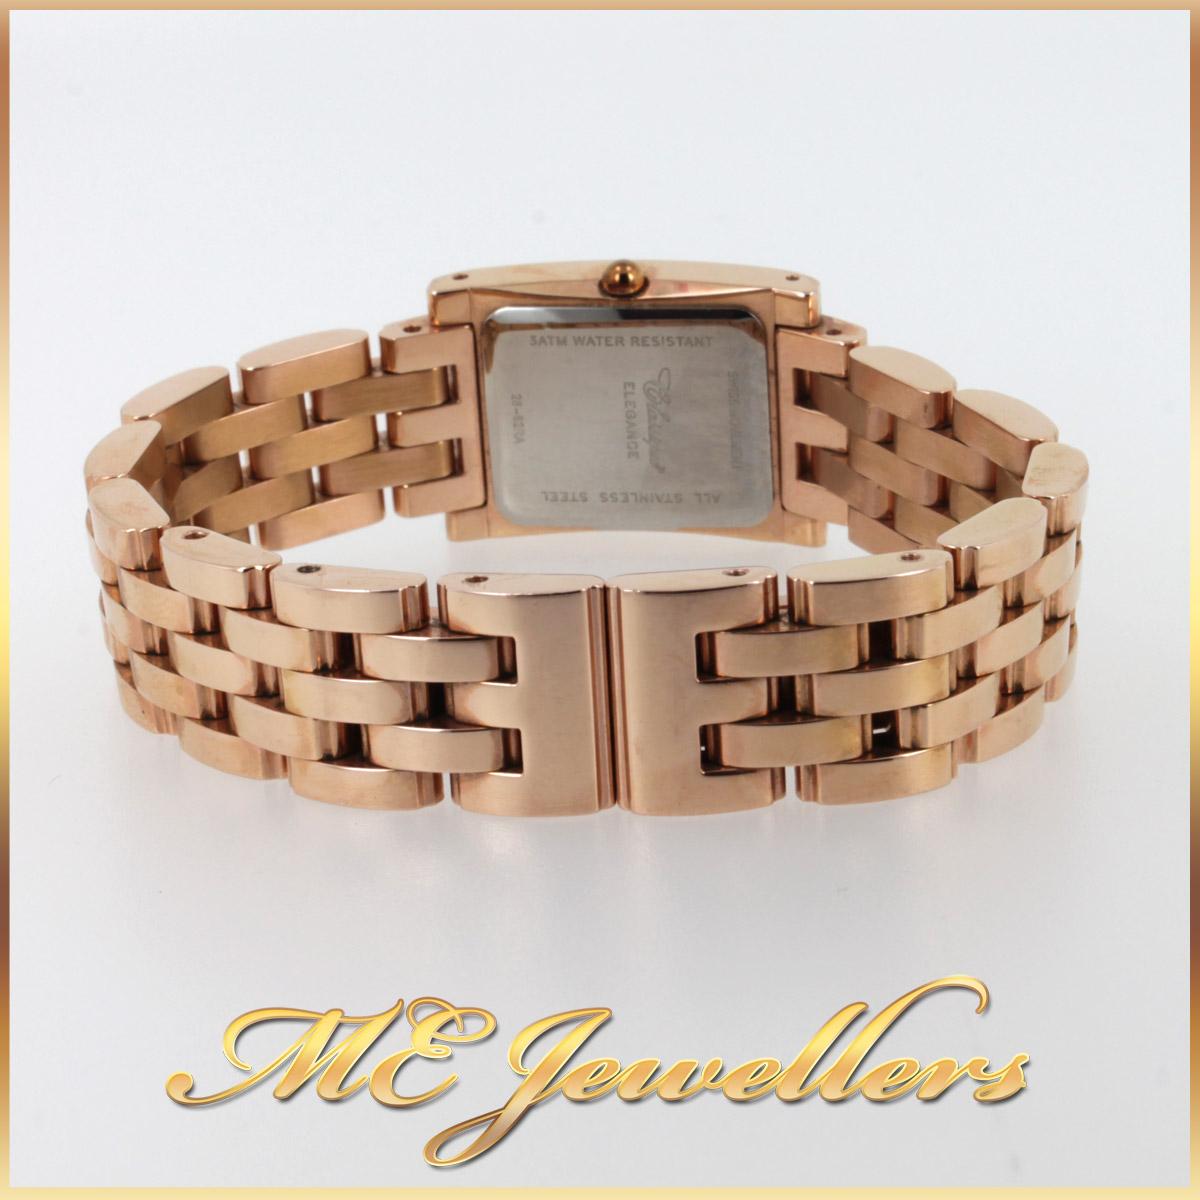 2057 Classique Ladies Watch Diamond Bezel clasp